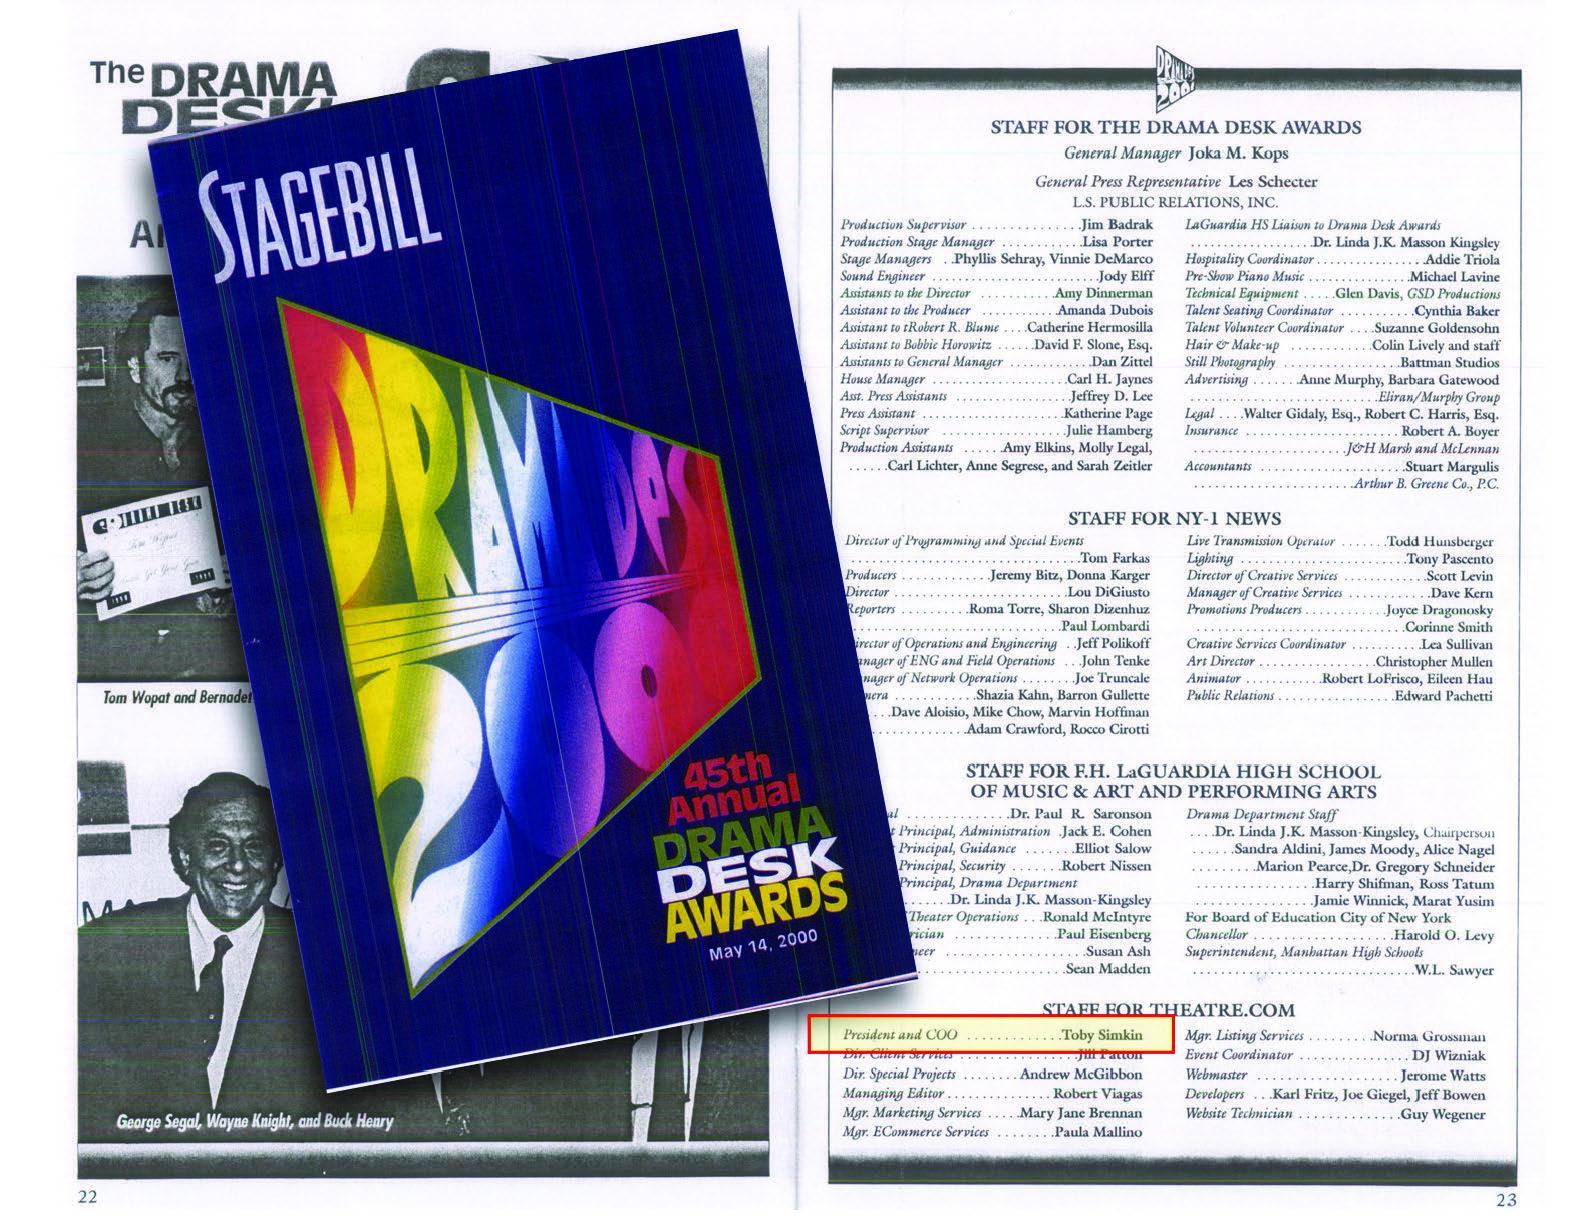 Drama Desk Awards 2000 New York Program